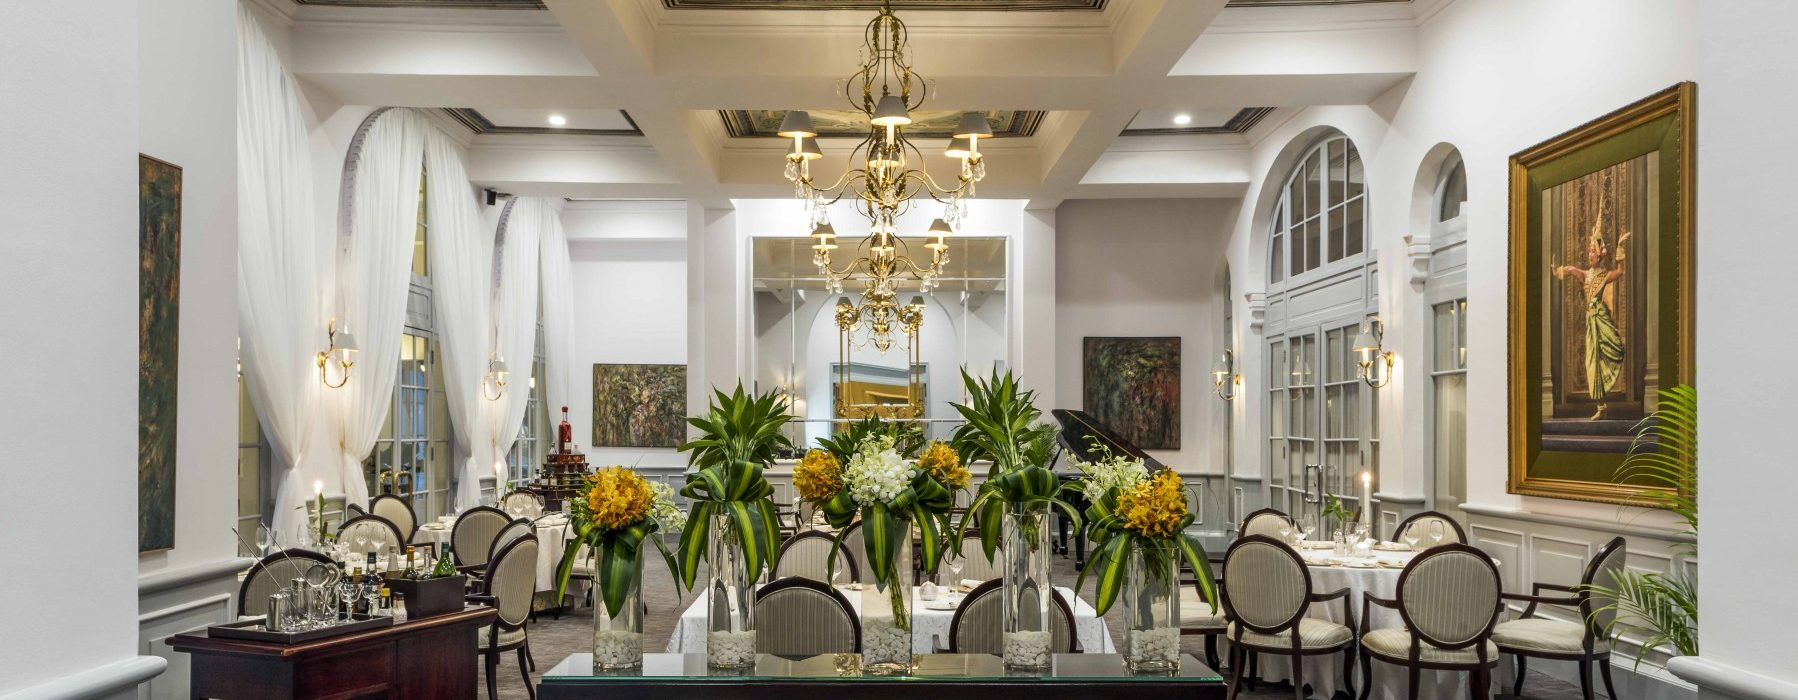 Raffles Hotel Le Royal Phnom Penh - Restaurants & Bars